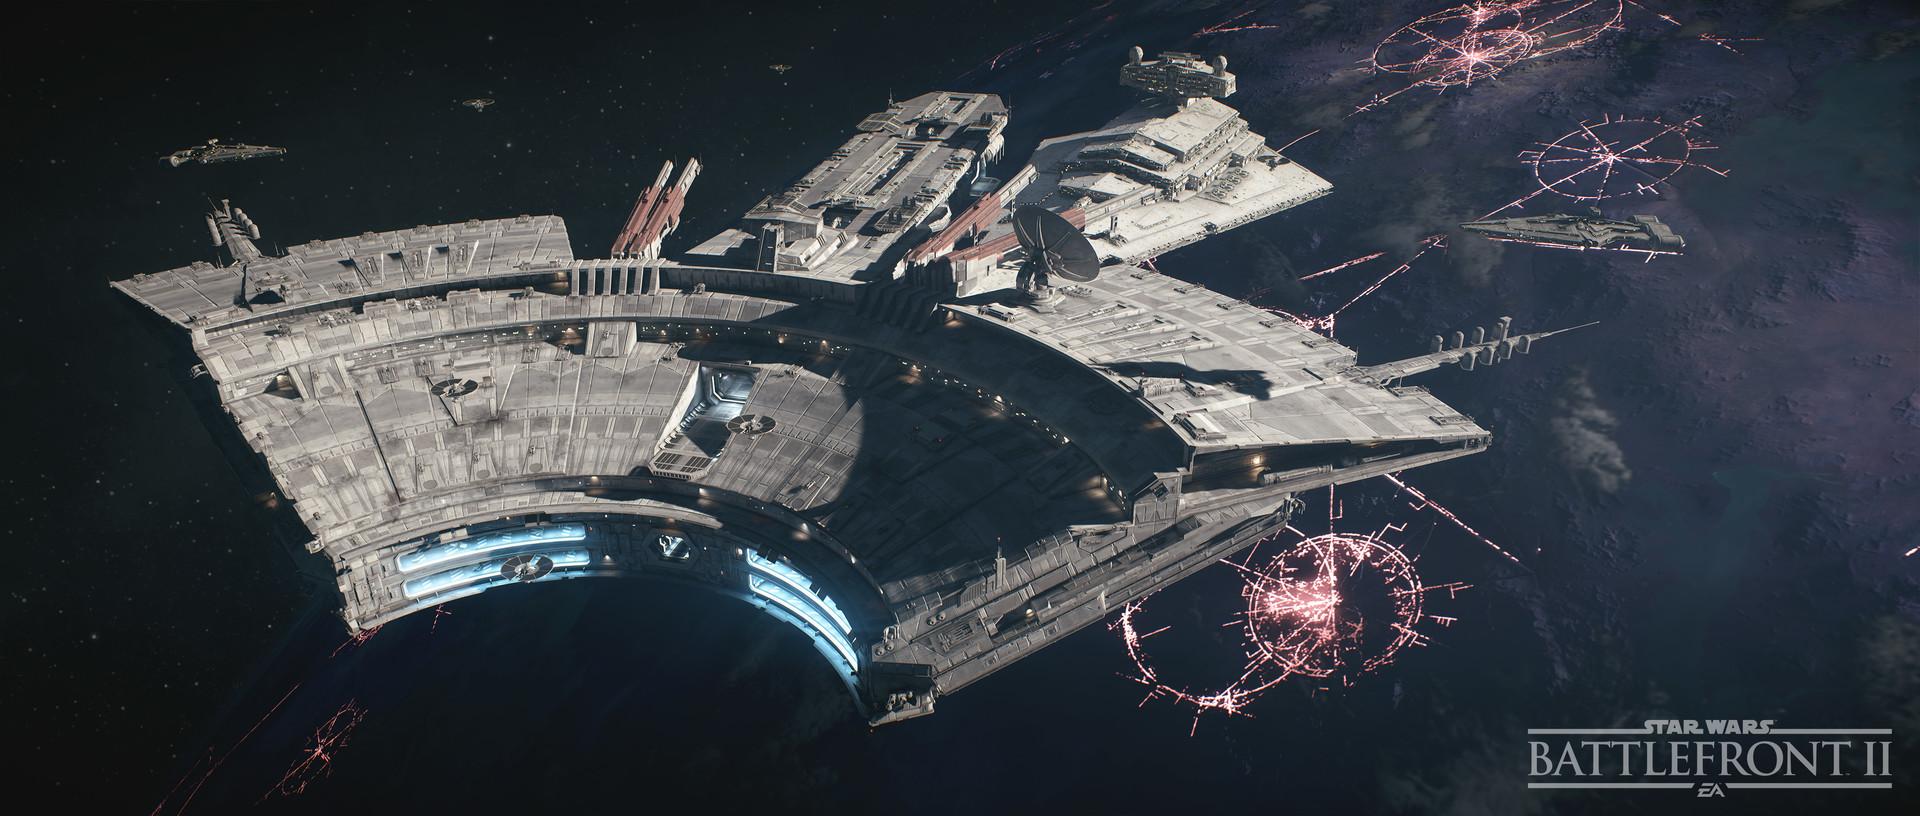 Darius kalinauskas fondor dock starwars conceptart battlefront 5